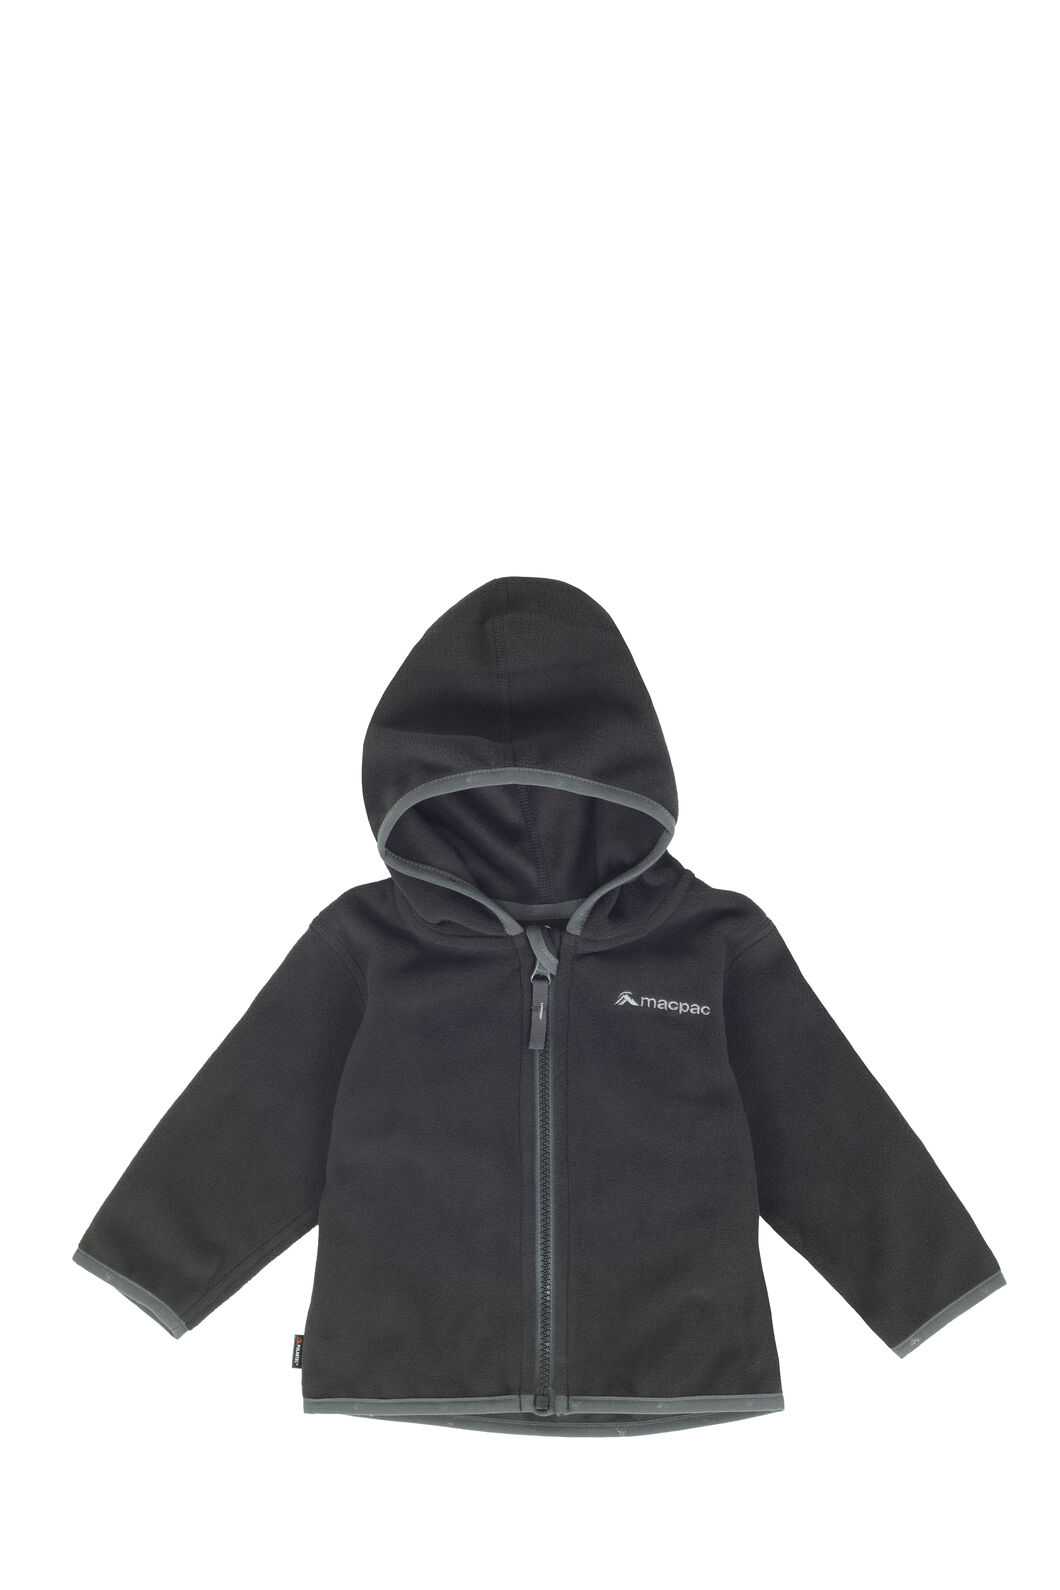 Macpac Mini Pepe Fleece Hoody - Baby, Black, hi-res